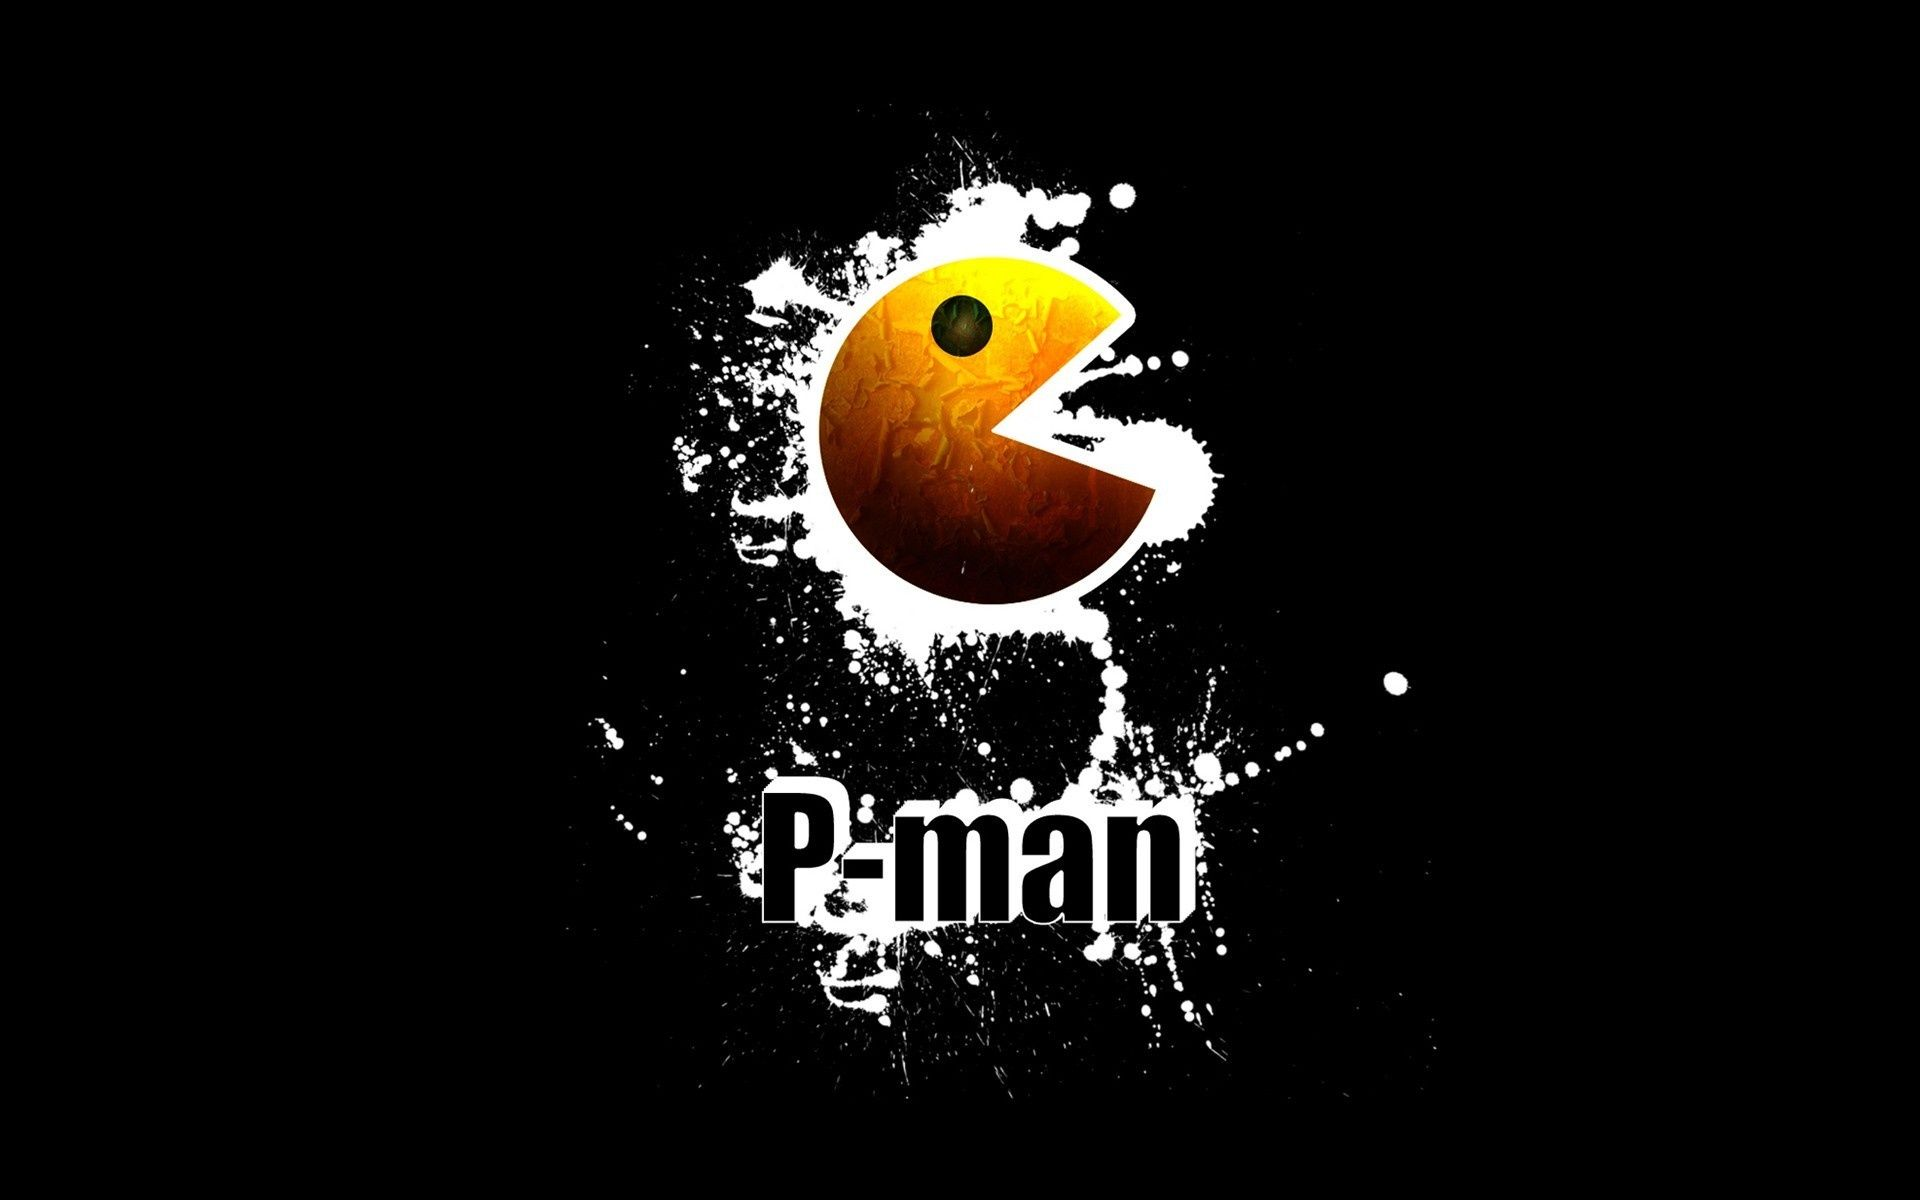 Pacman Game iPhone Wallpaper iPod Wallpaper HD Free Download